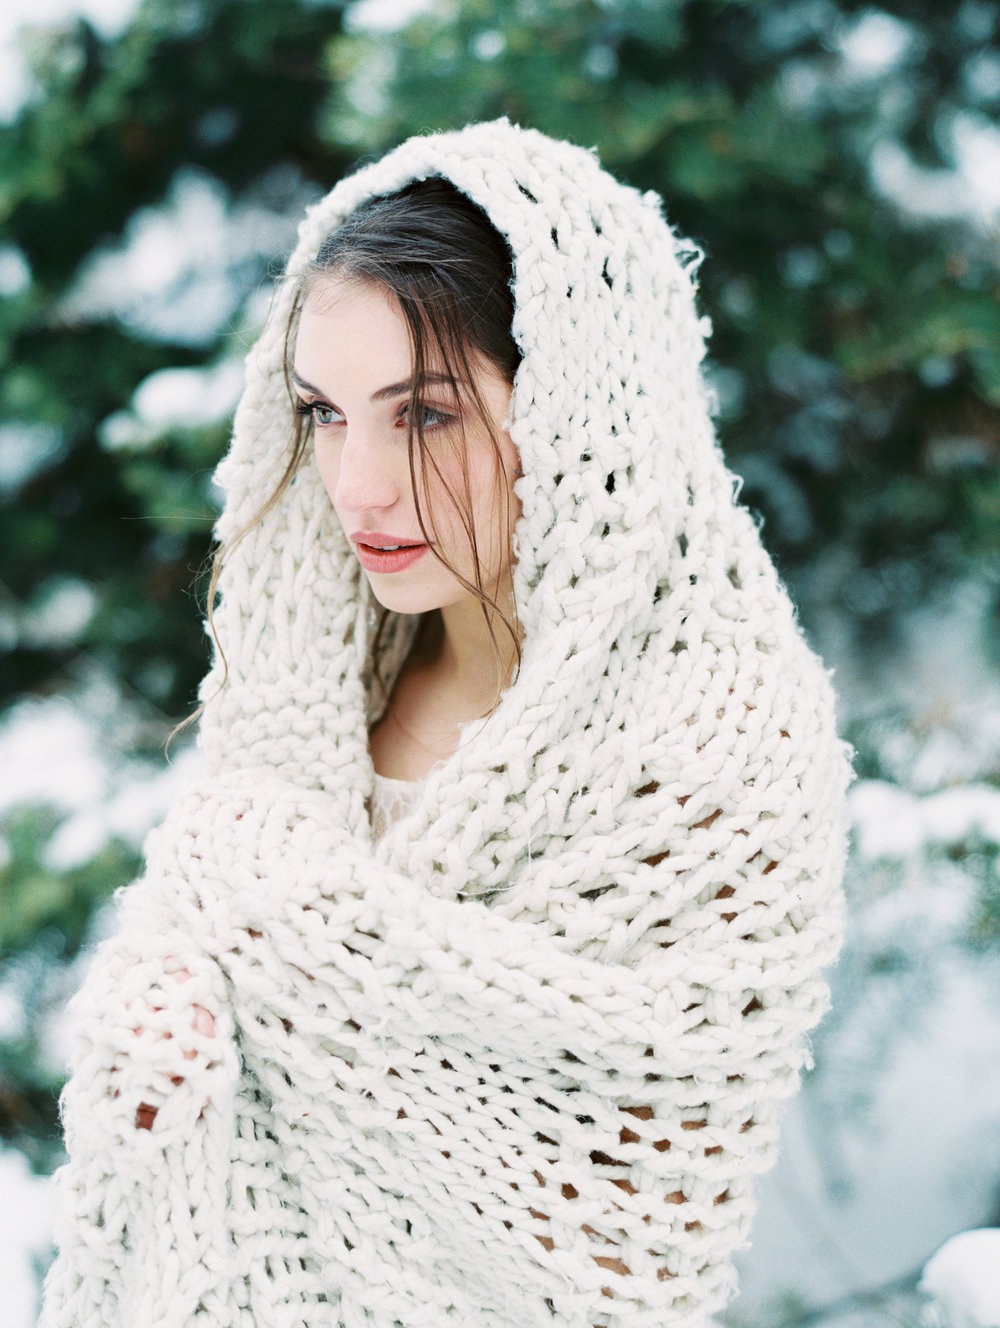 BellaCosa_WinterWonderland-18.jpg